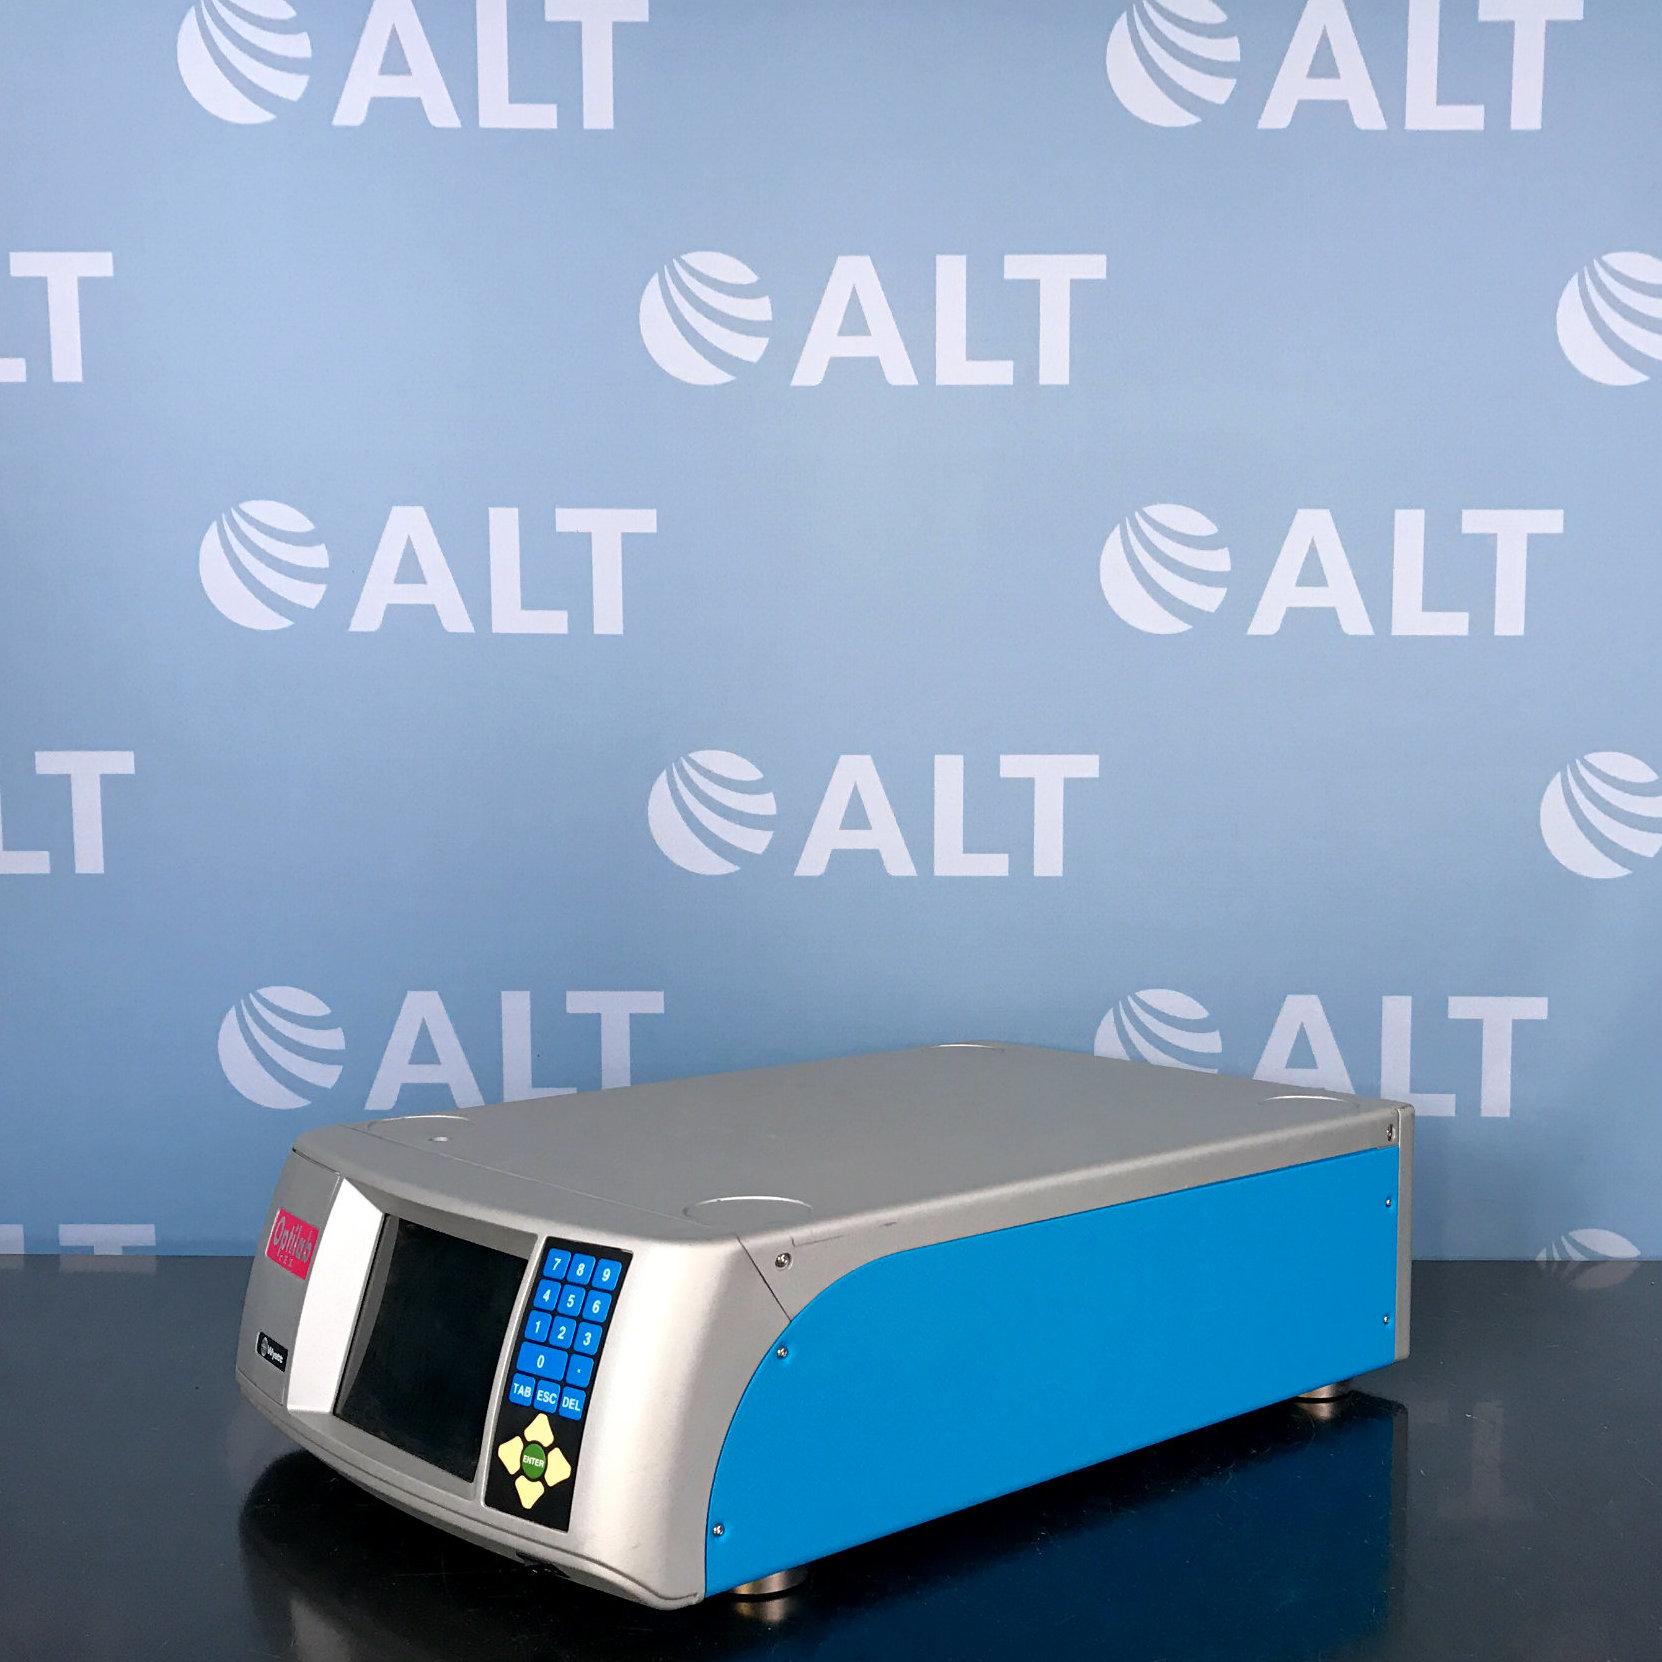 Wyatt Technology Optilab rEX Refractometer Model WREX-03 Image